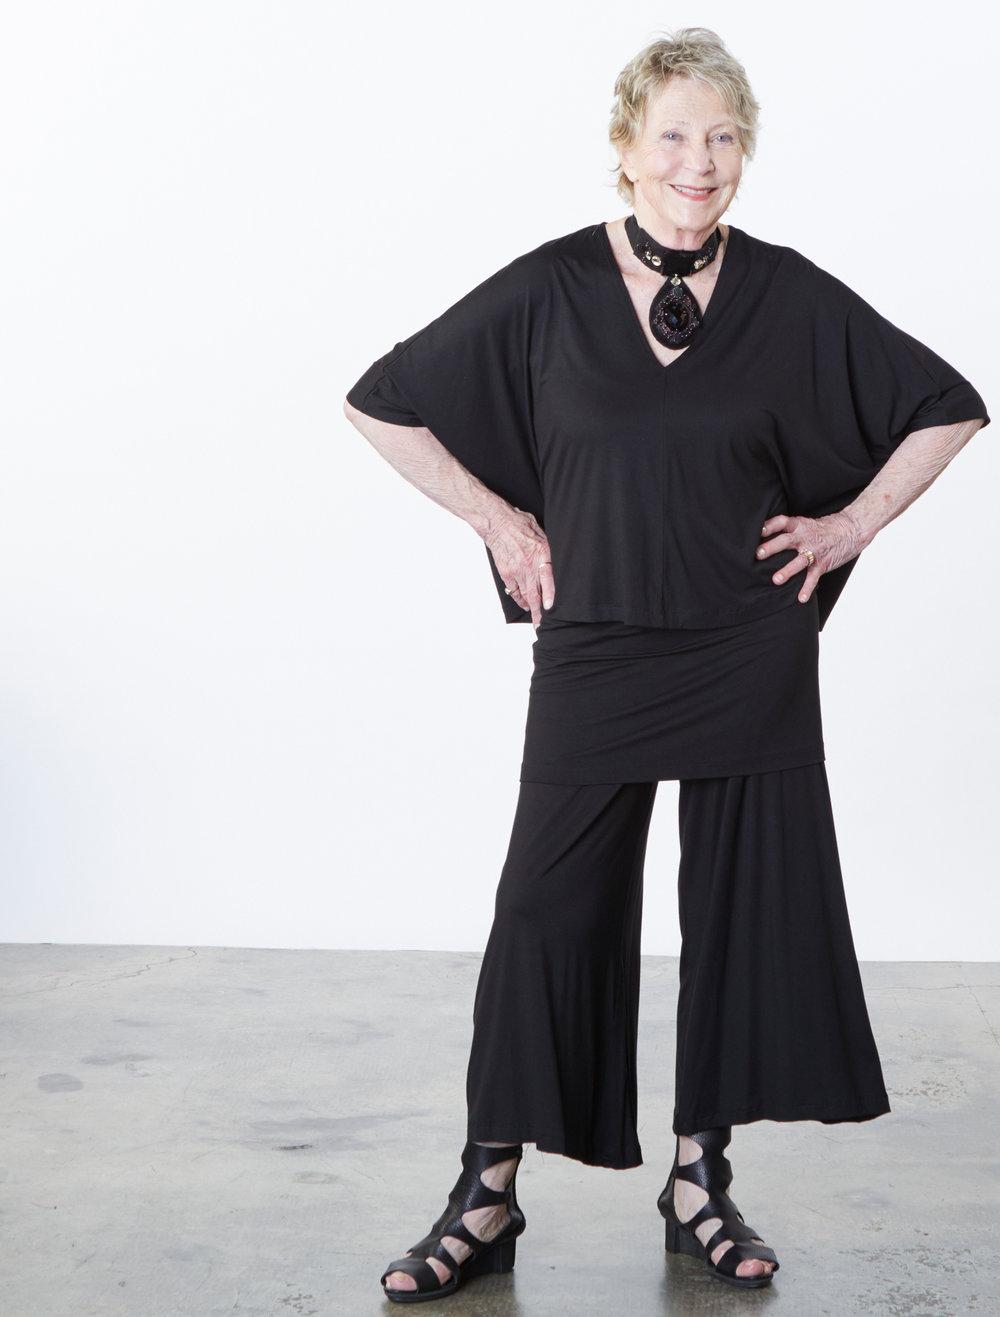 Rey Shirt, Lola Tank, Ella Pant in Black Italian Viscose Jersey